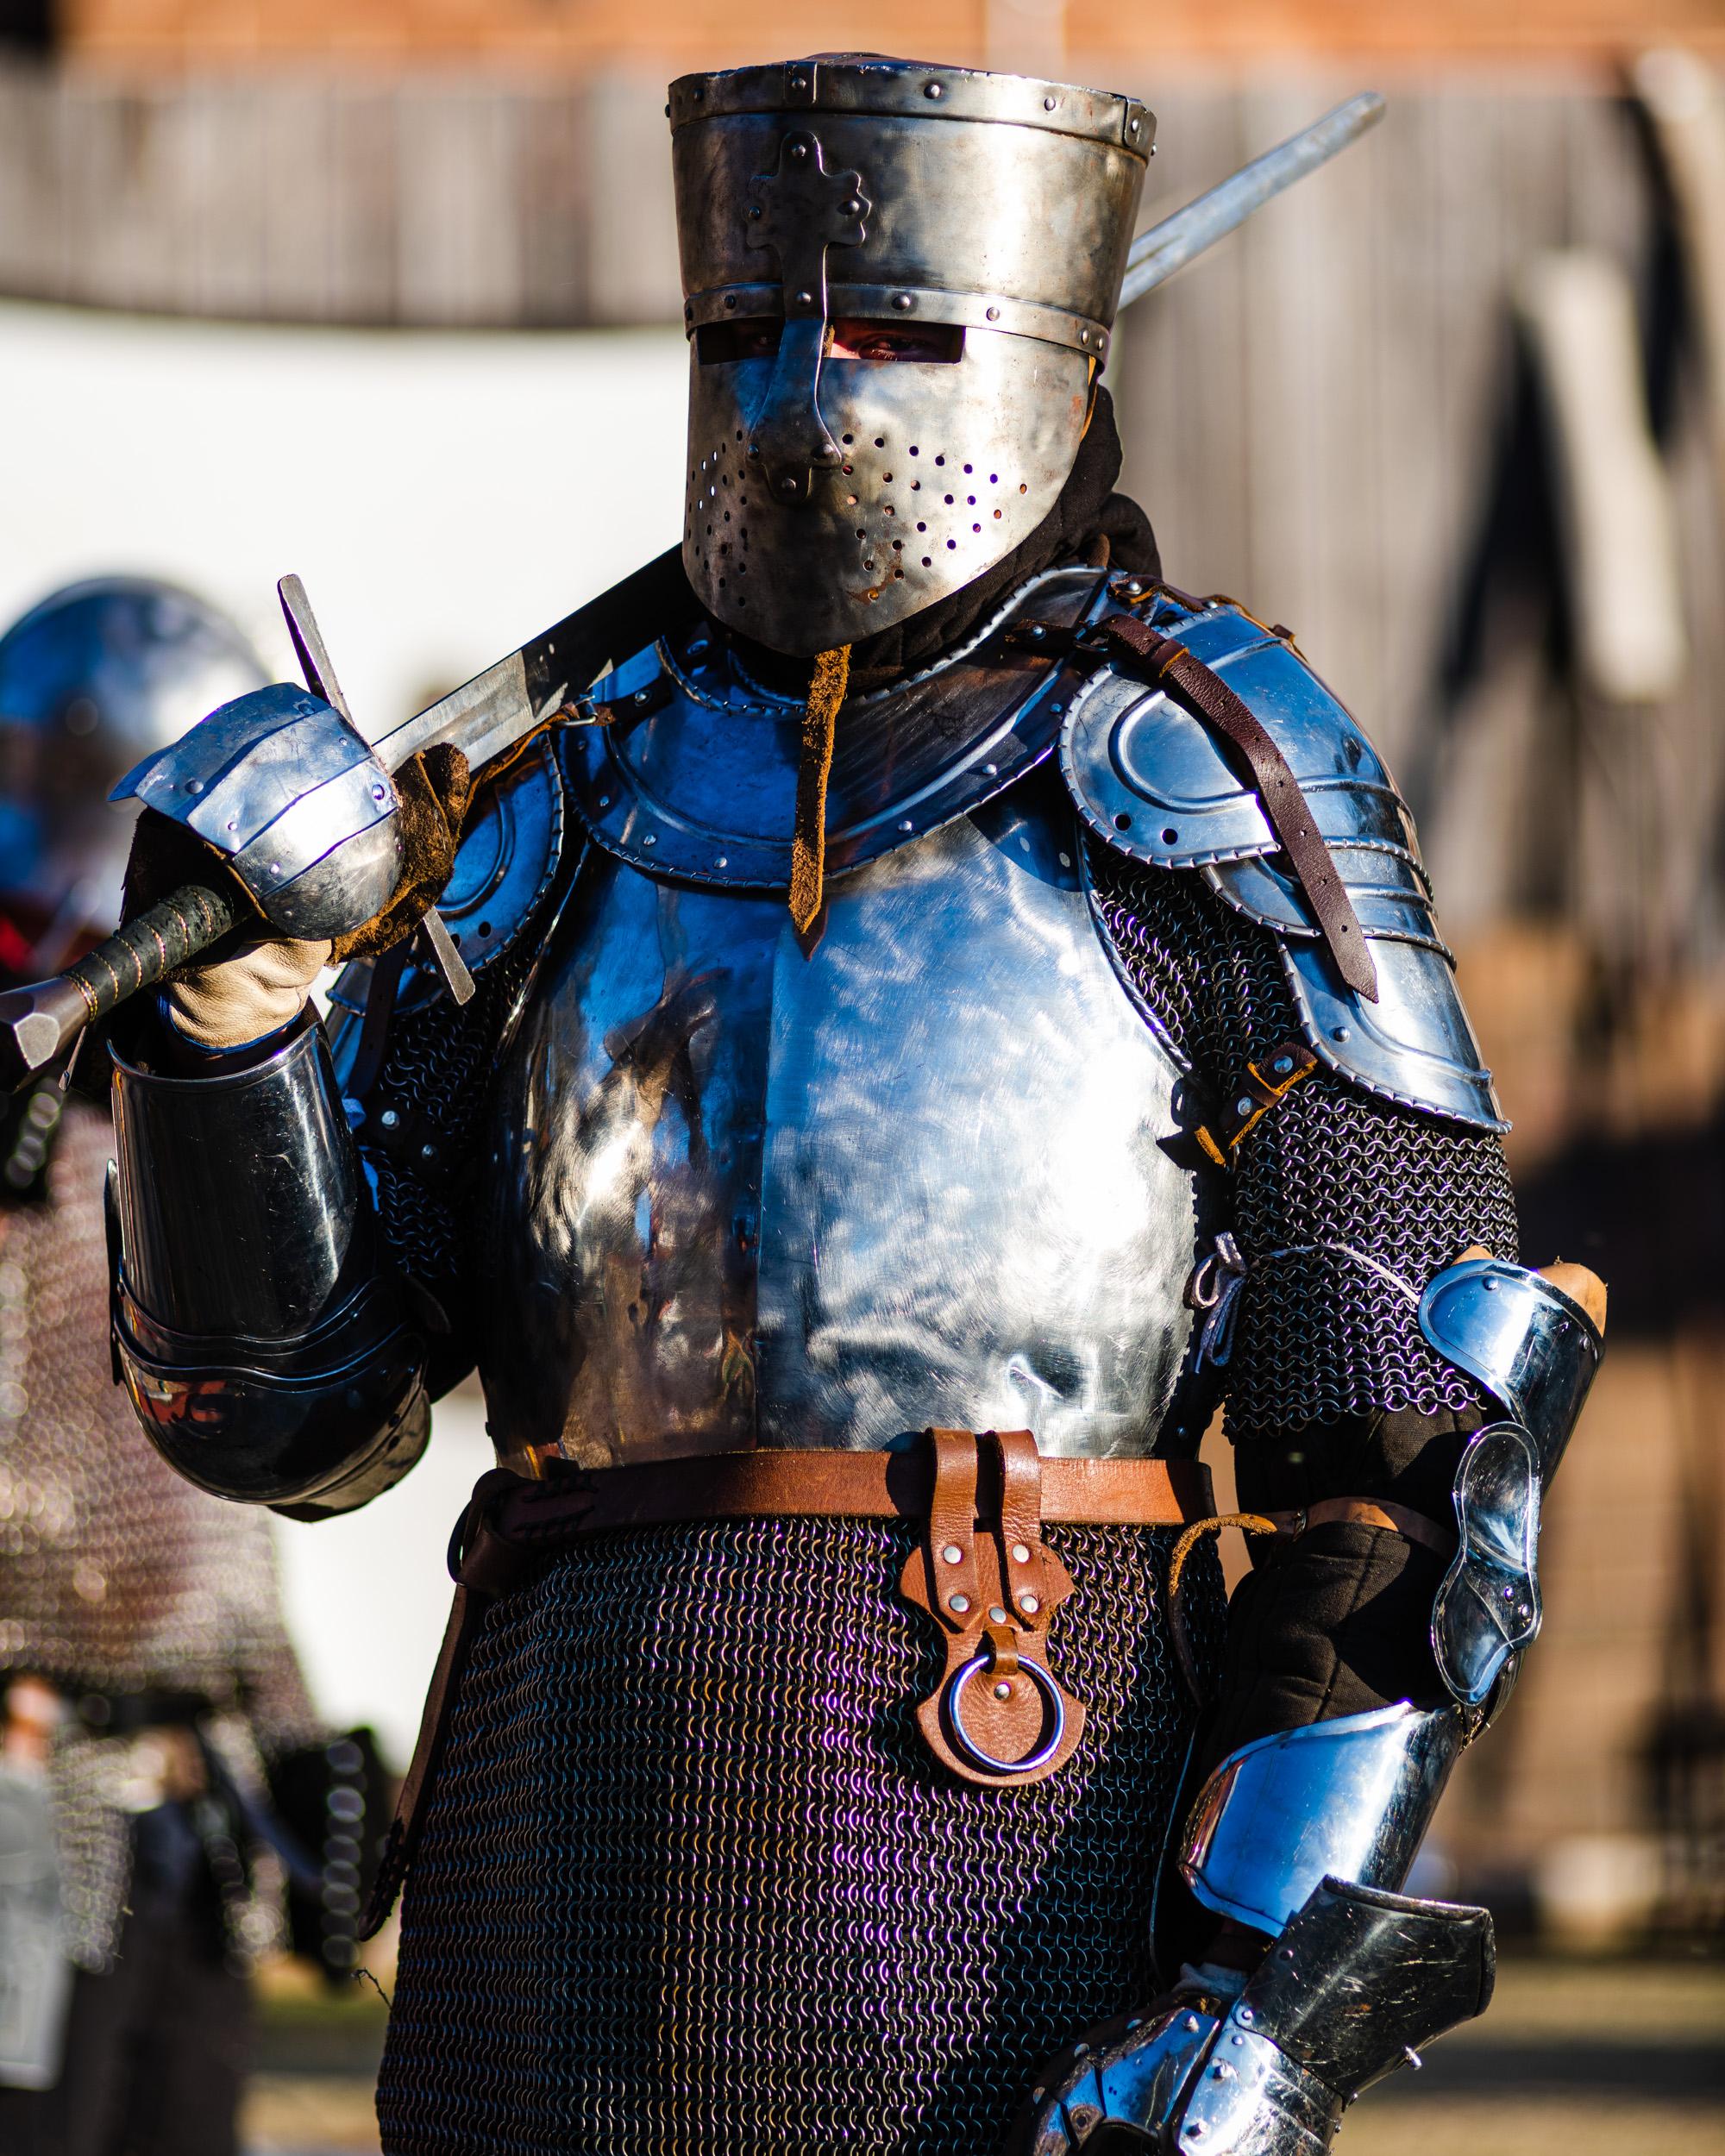 Spyrides_Kyle_Soul.Gazing.Photography_Medieval.Day_Reenactment.Group.Einherjar_Danelaw.Medieval.Fighting.Society_Petersham.Bowling.Club_18.8.2019DSC_0582.jpg